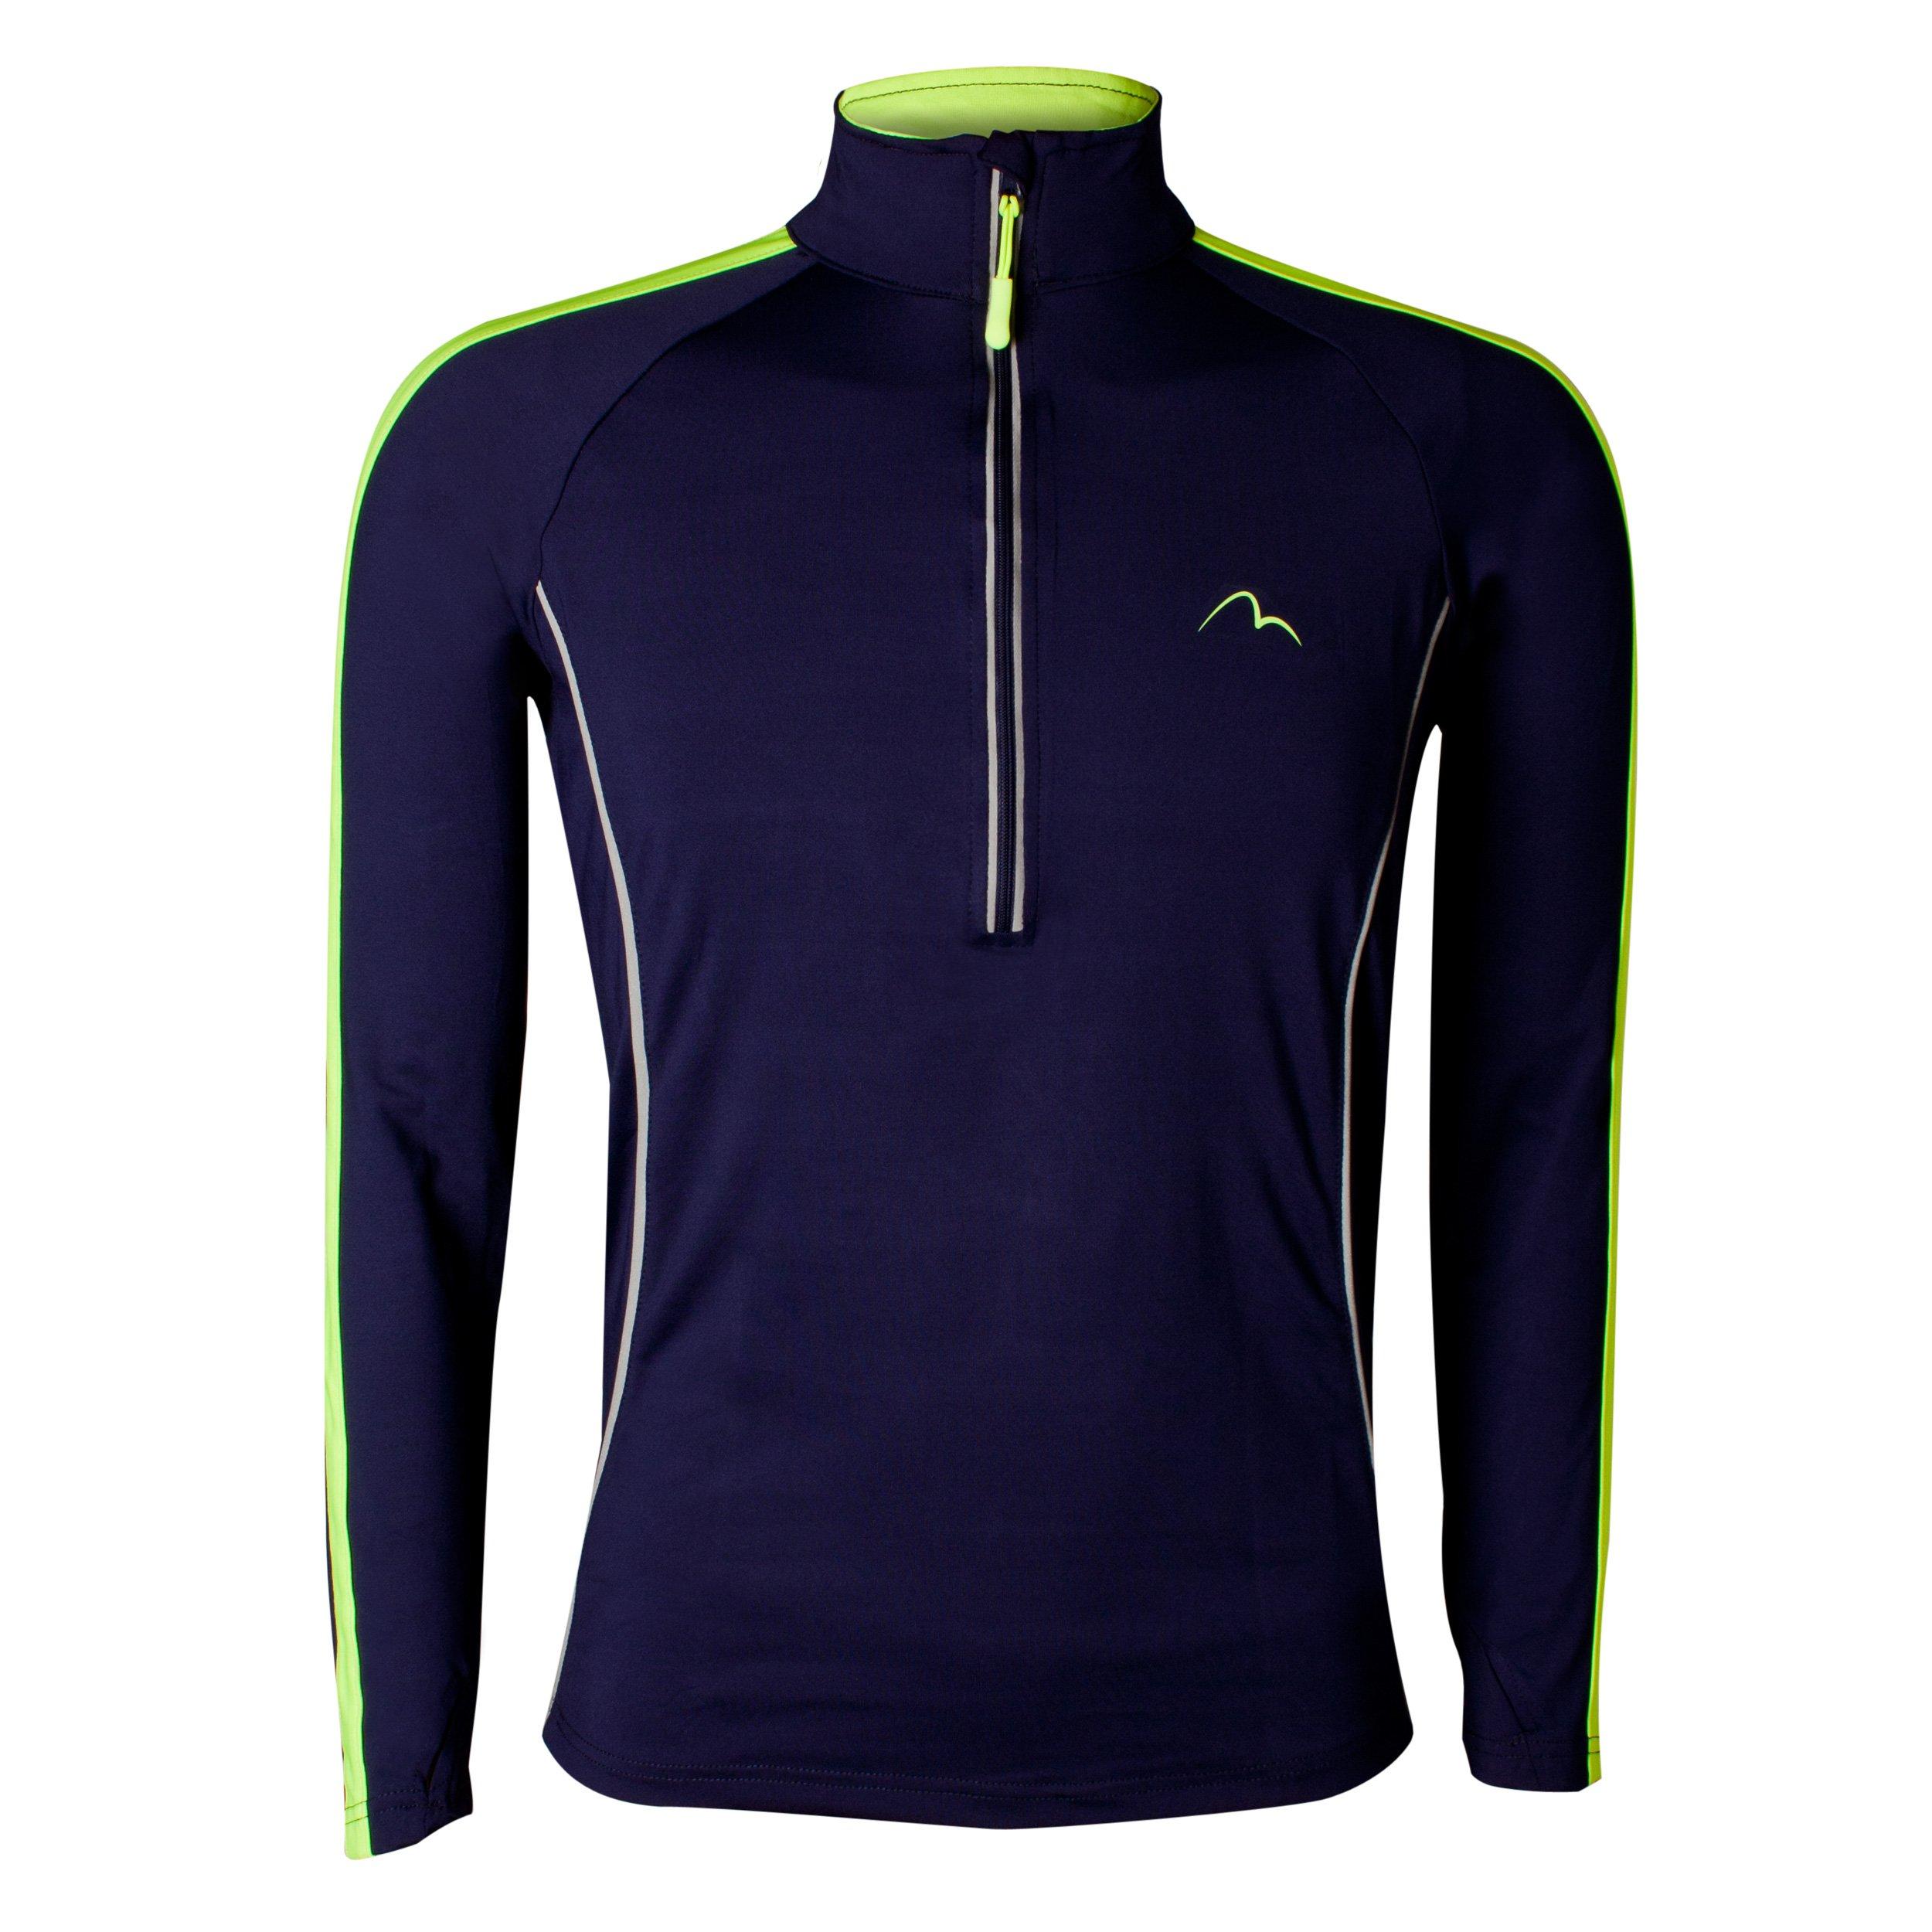 More Mile Hi-Viz Mens Running Top Half-Zip Long Sleeve Sports Training Bekleidung